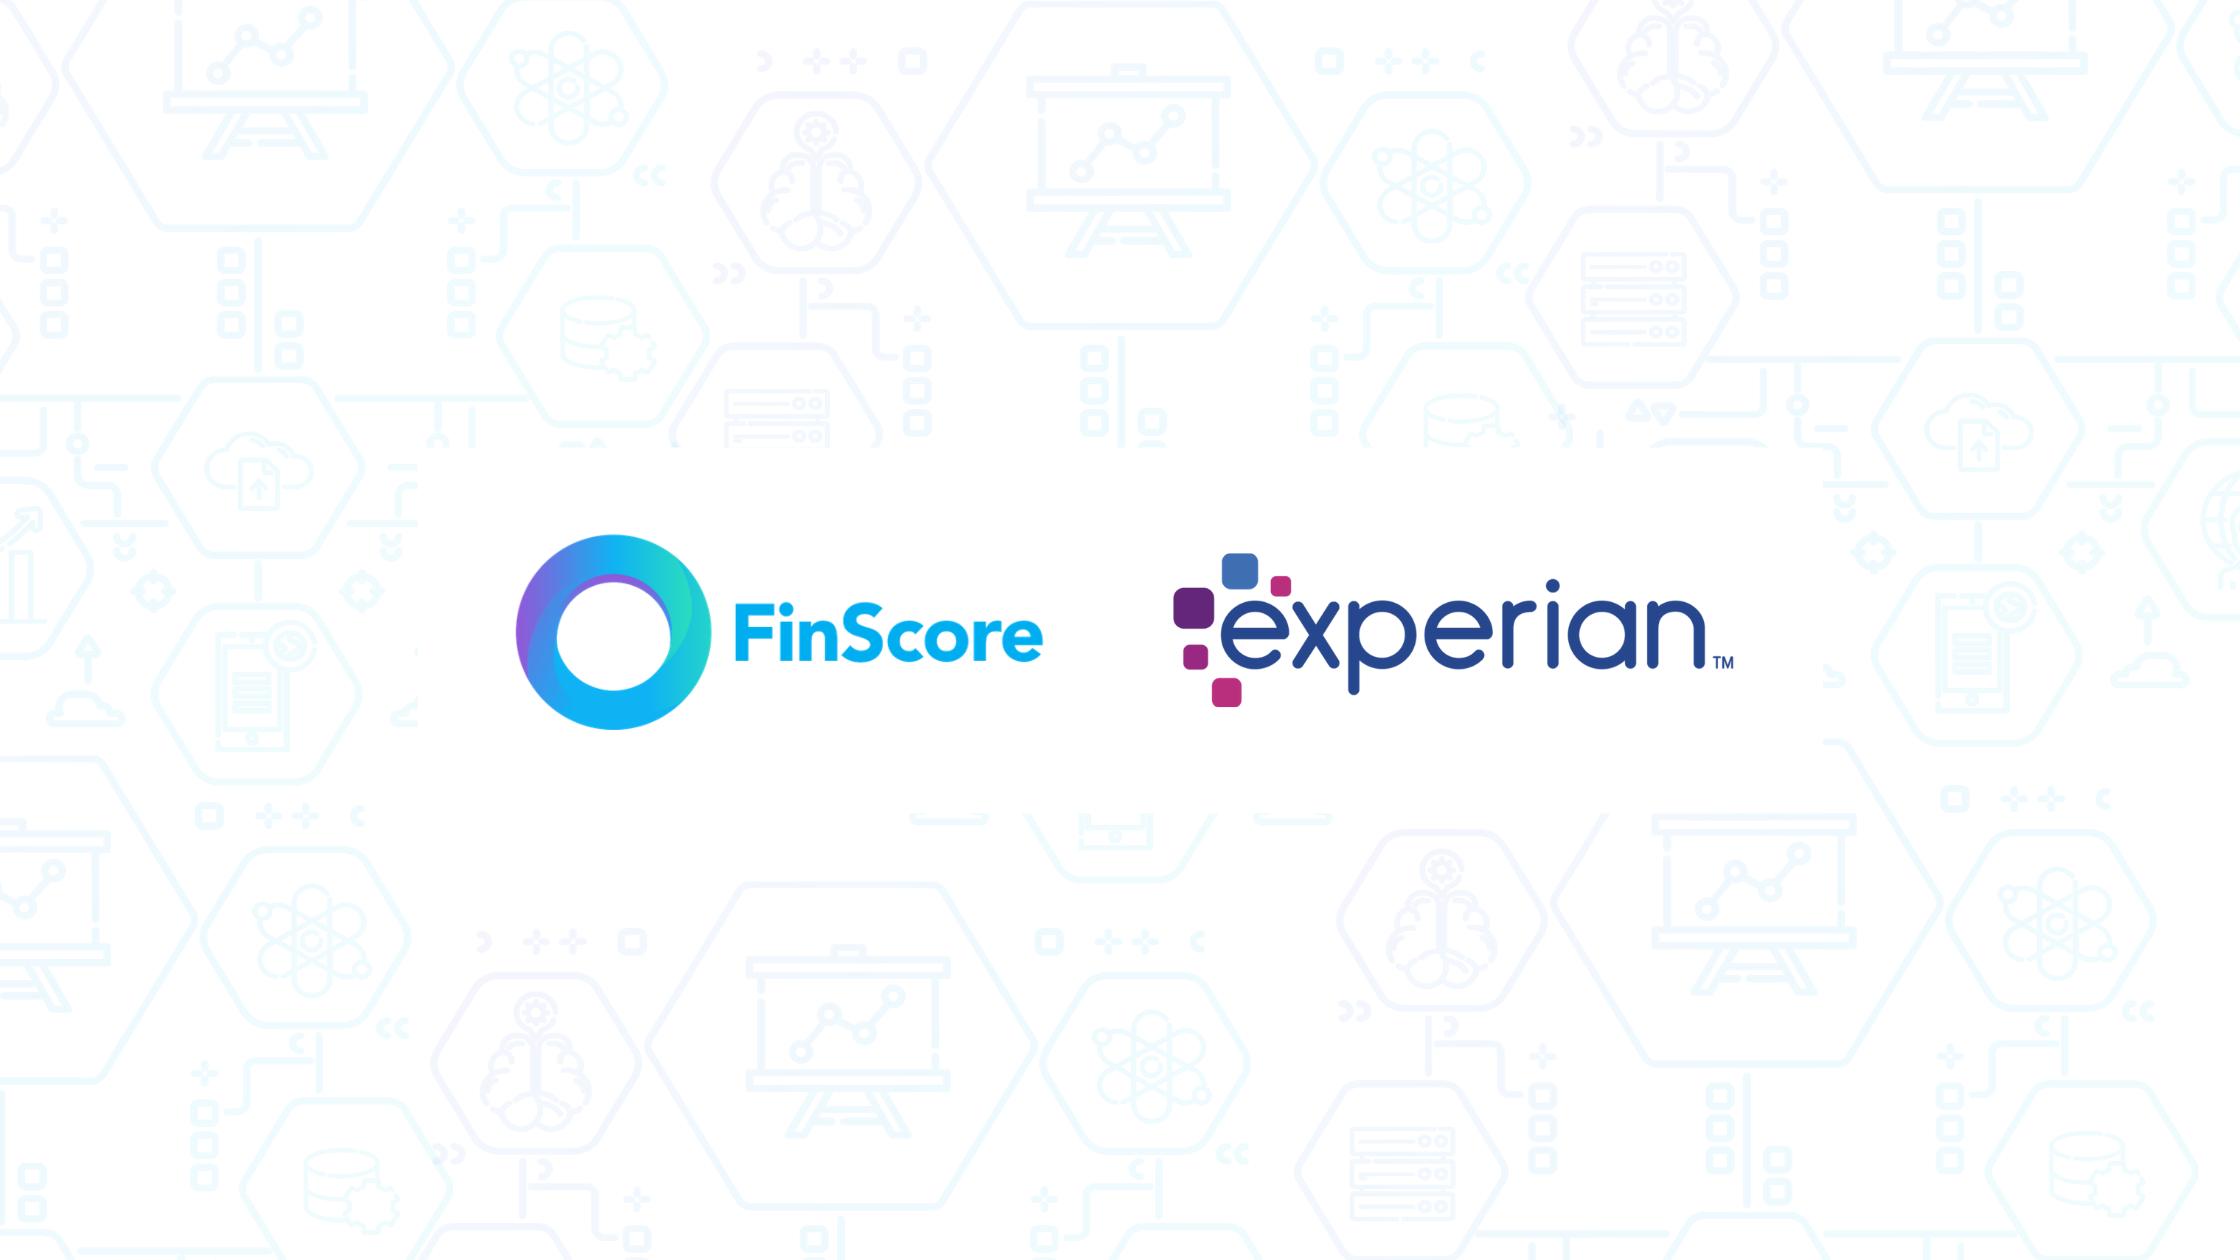 FinScore x Experian Partnership